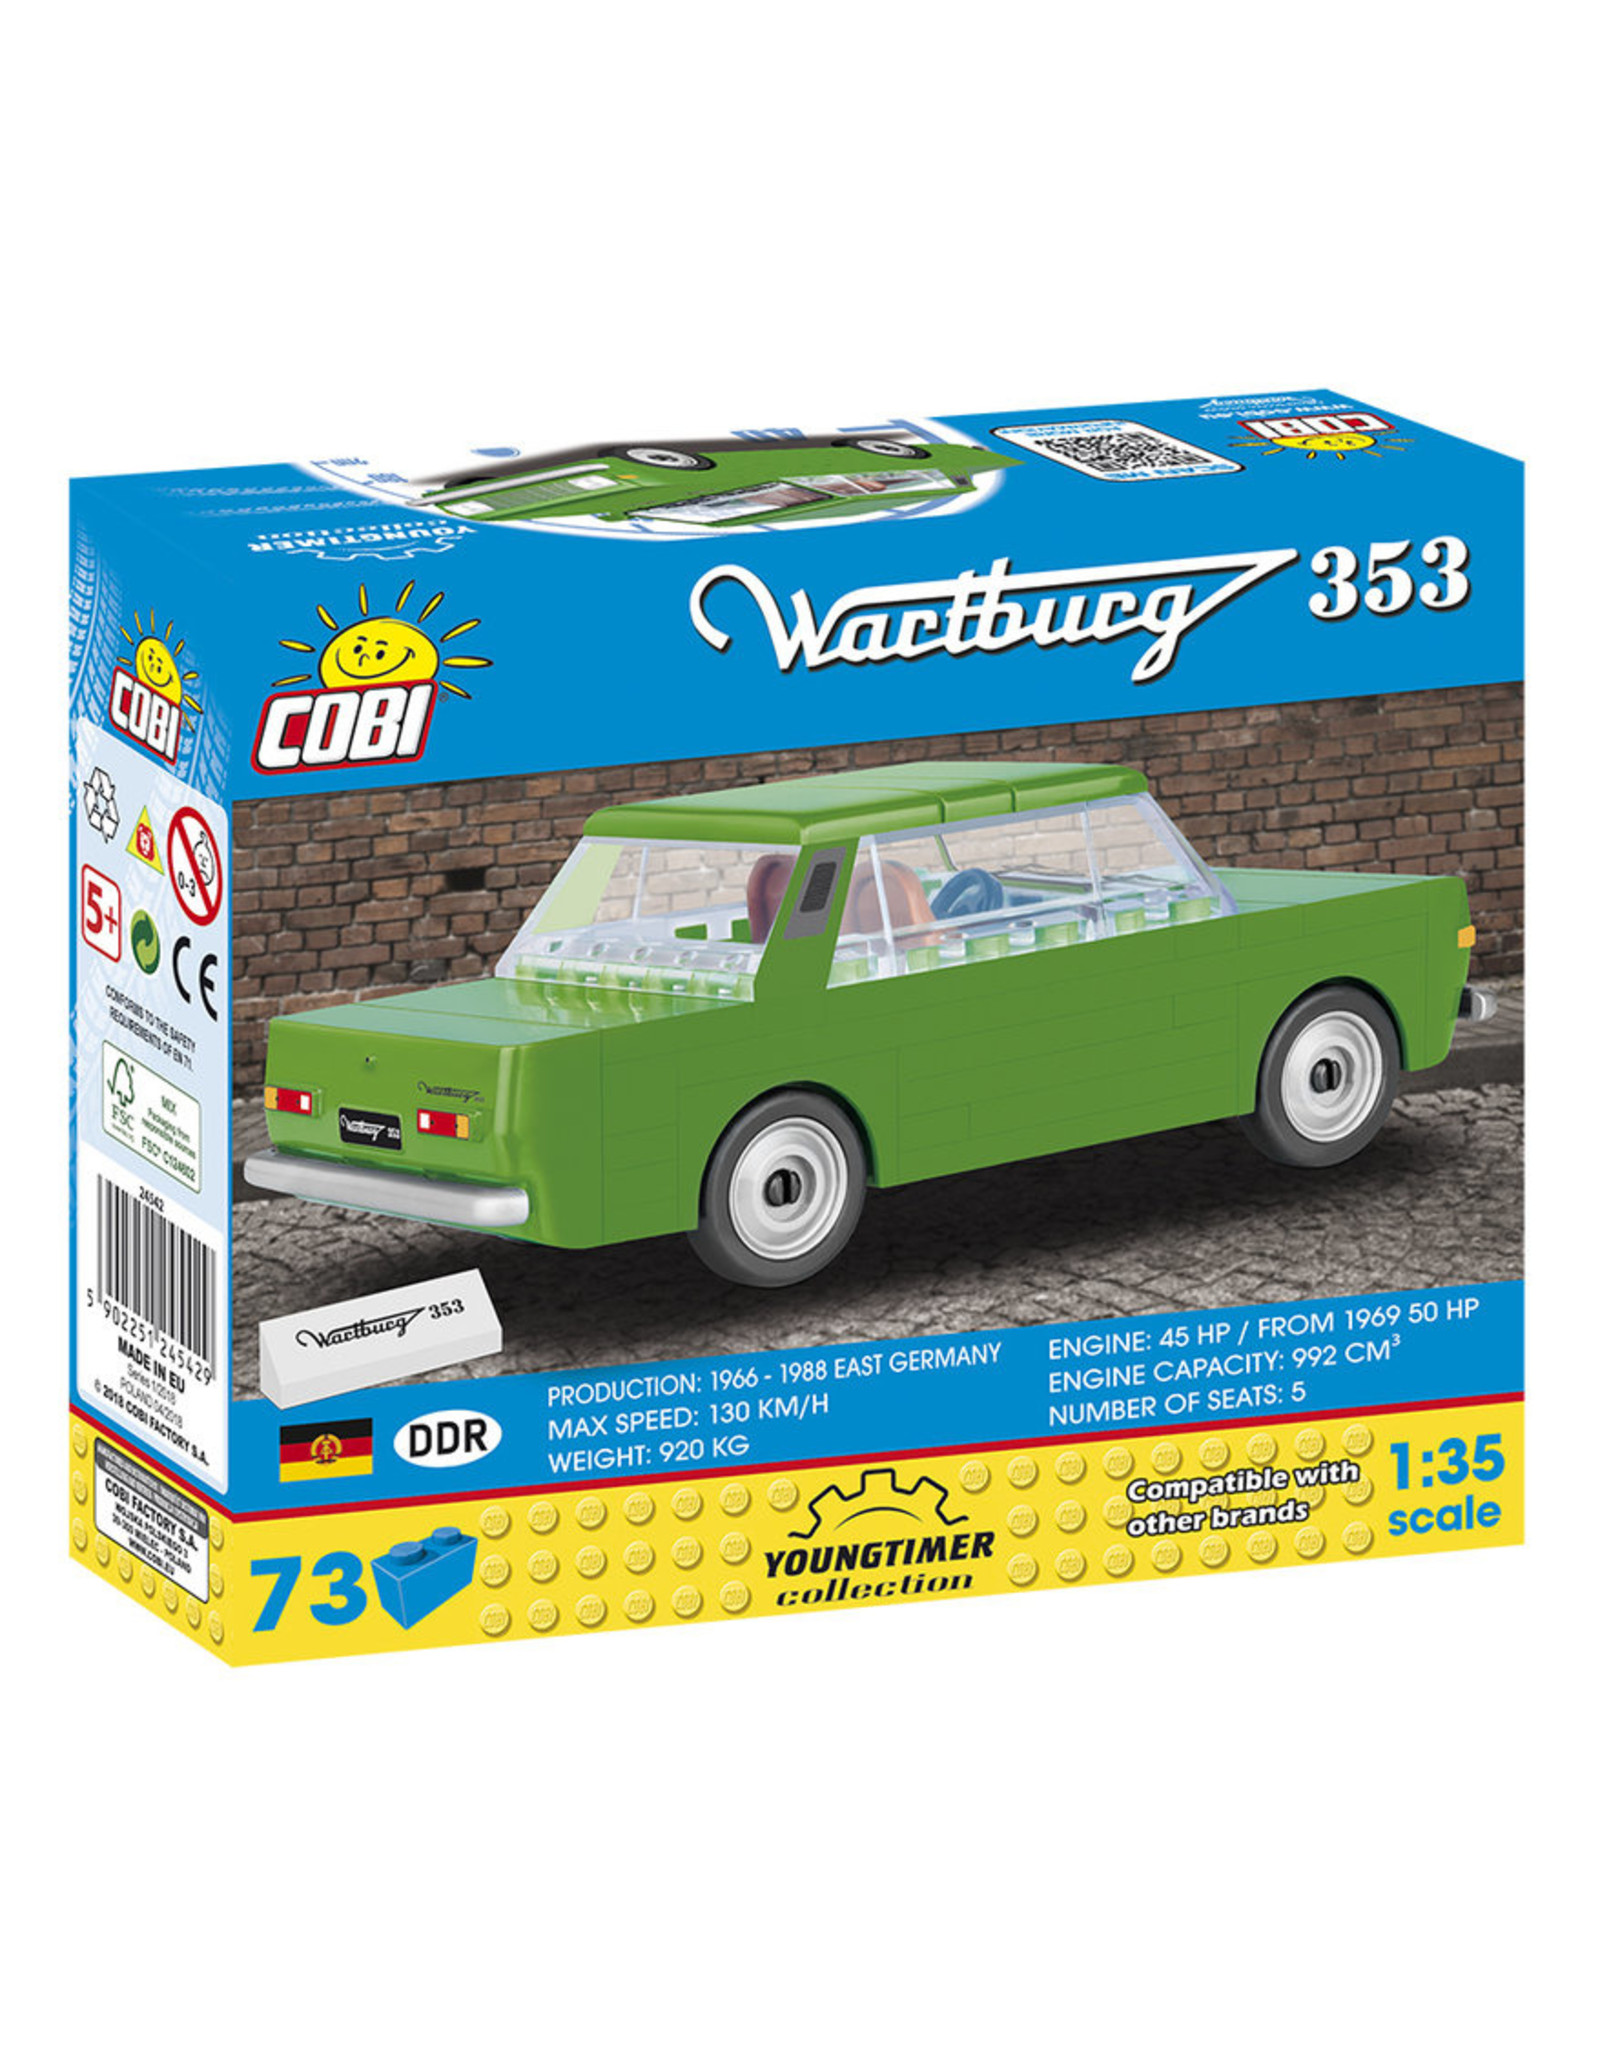 COBI COBI 24542 - Wartburg 353